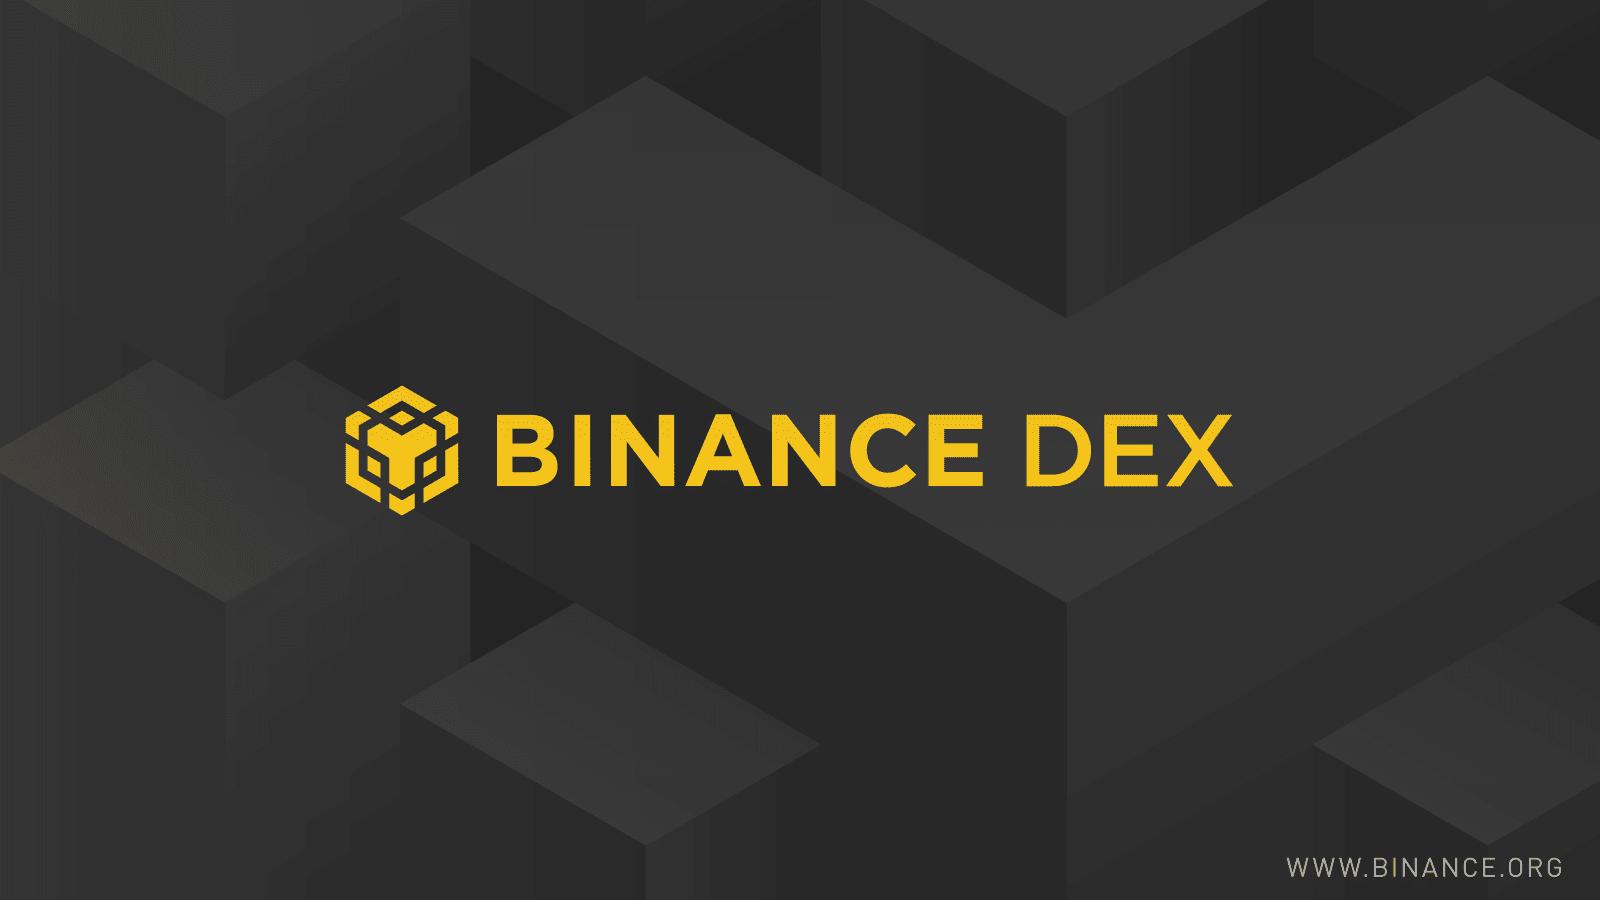 Binance lancia la Testnet del DEX  che sancisce la nuova era del trading di criptovalute peer-to-peer